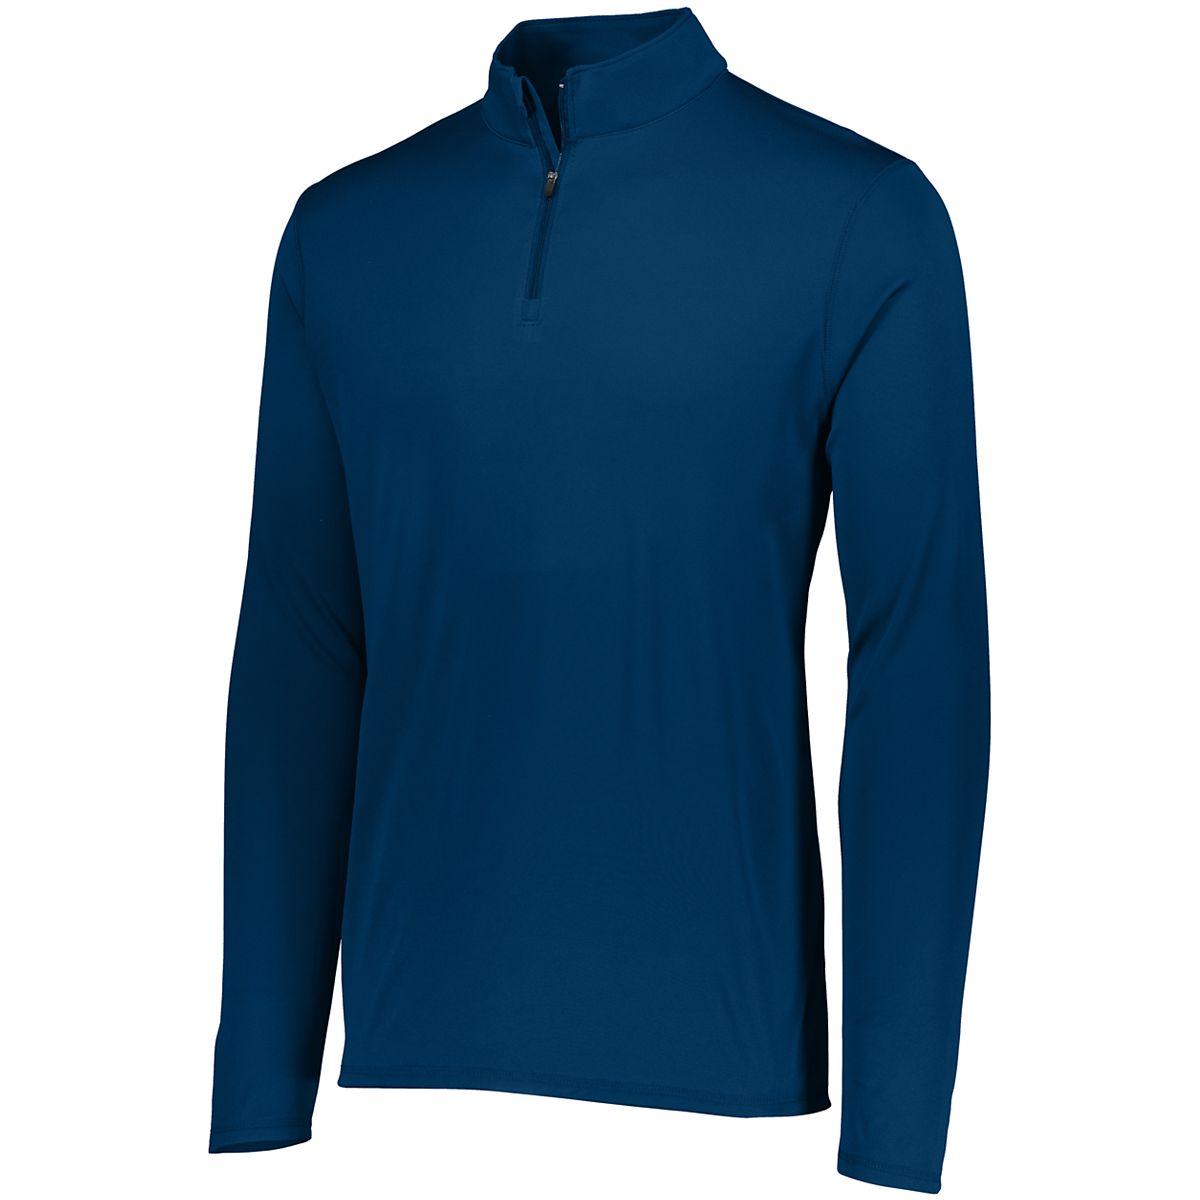 Augusta Youth Attain 1/4 Zip Pullover Navy S - image 1 de 1